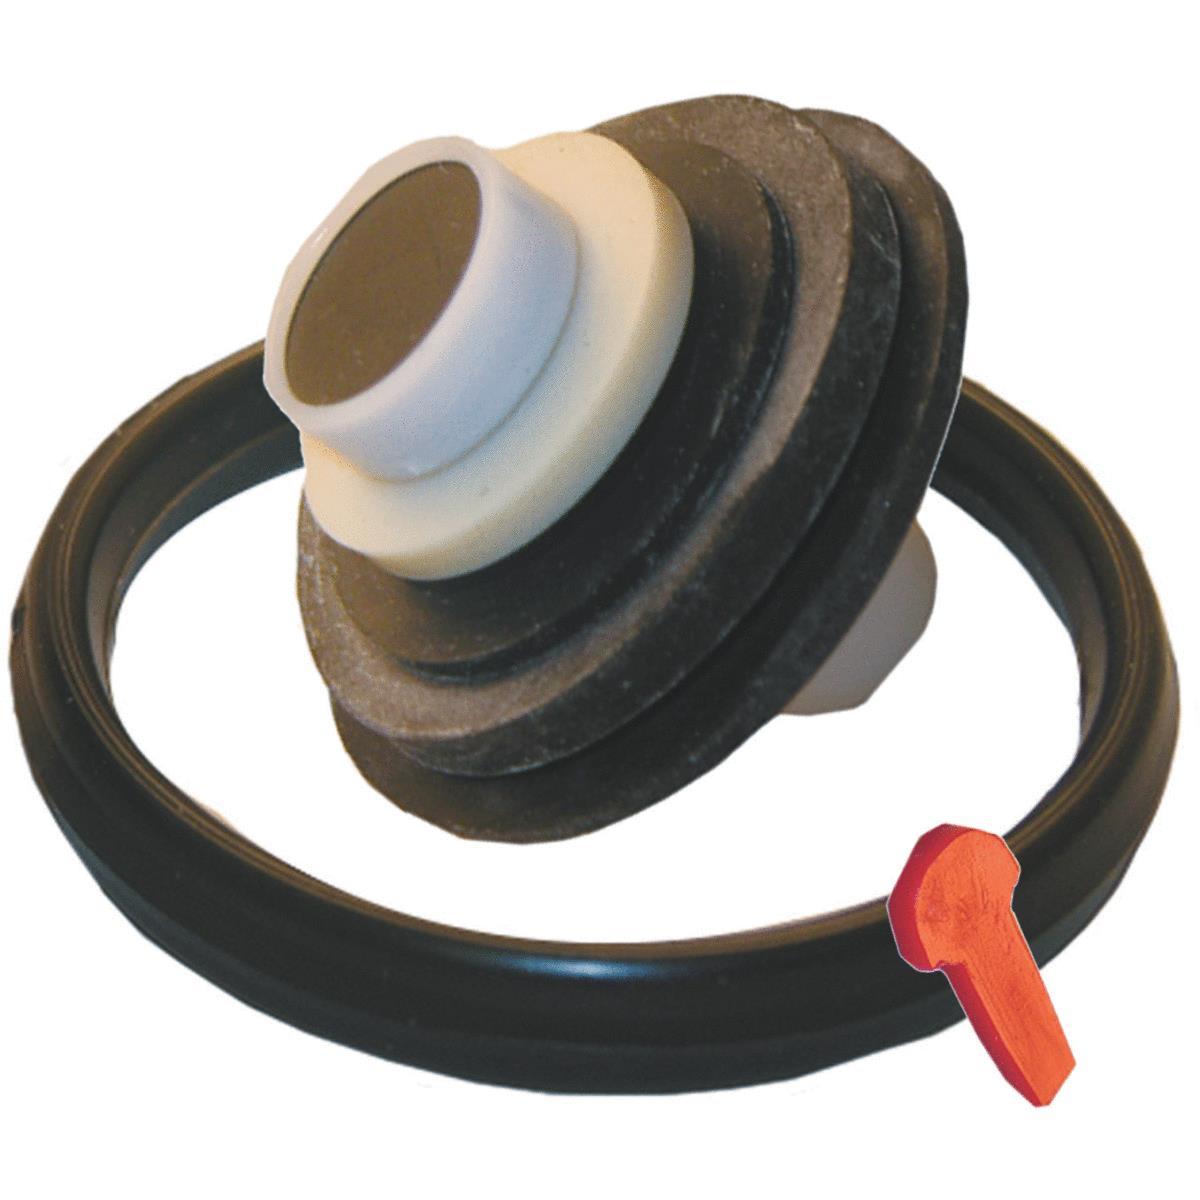 Lasco Ballcock Repair Kit With Plunger, Gasket & Locking Pin For Coast Mark III